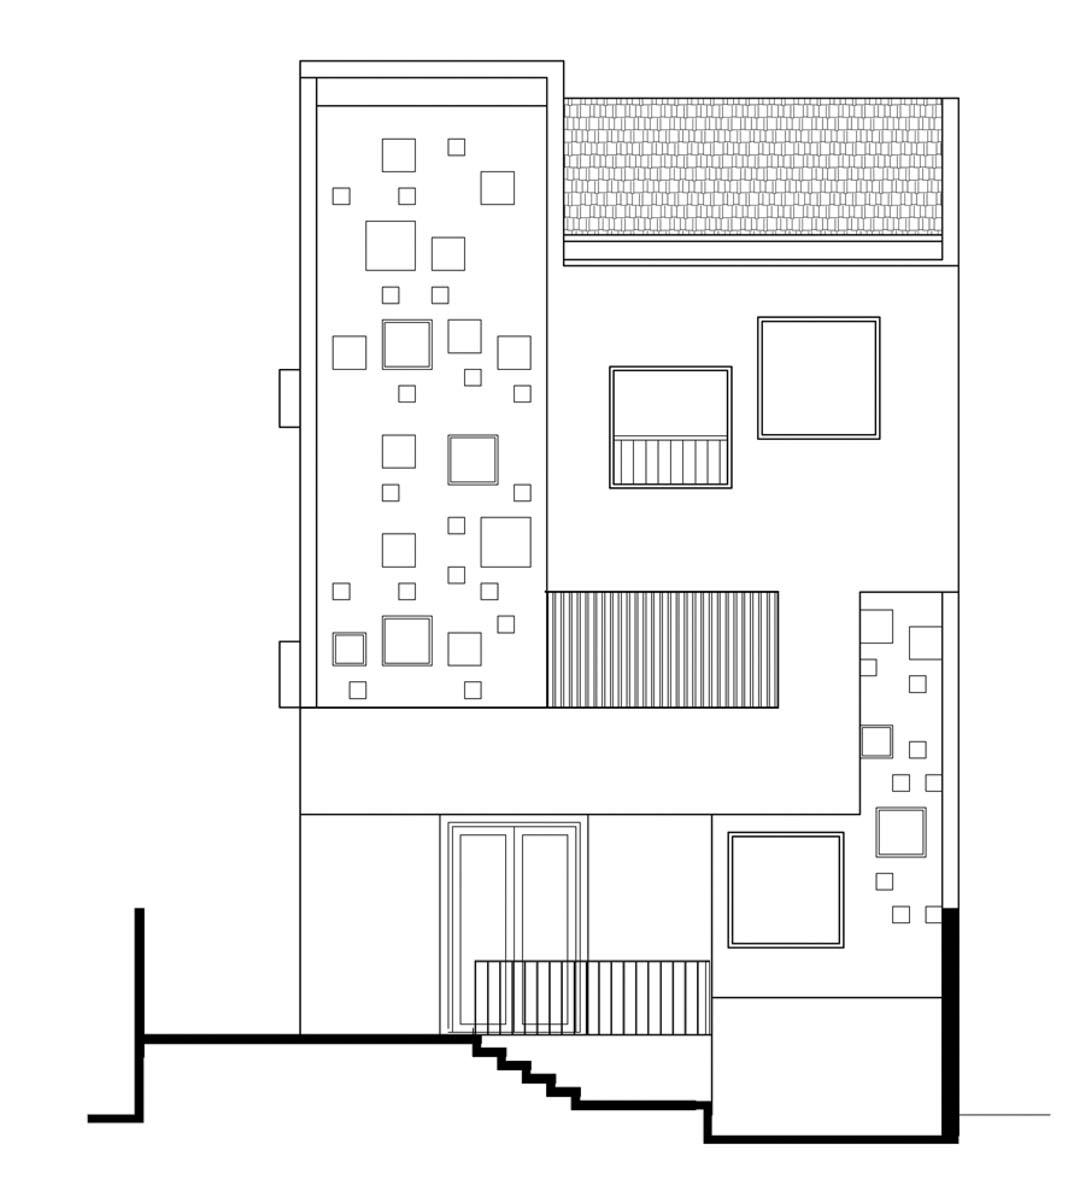 gia-tri-cua-su-dung-hoa-matdung1-ktruc-229-2015